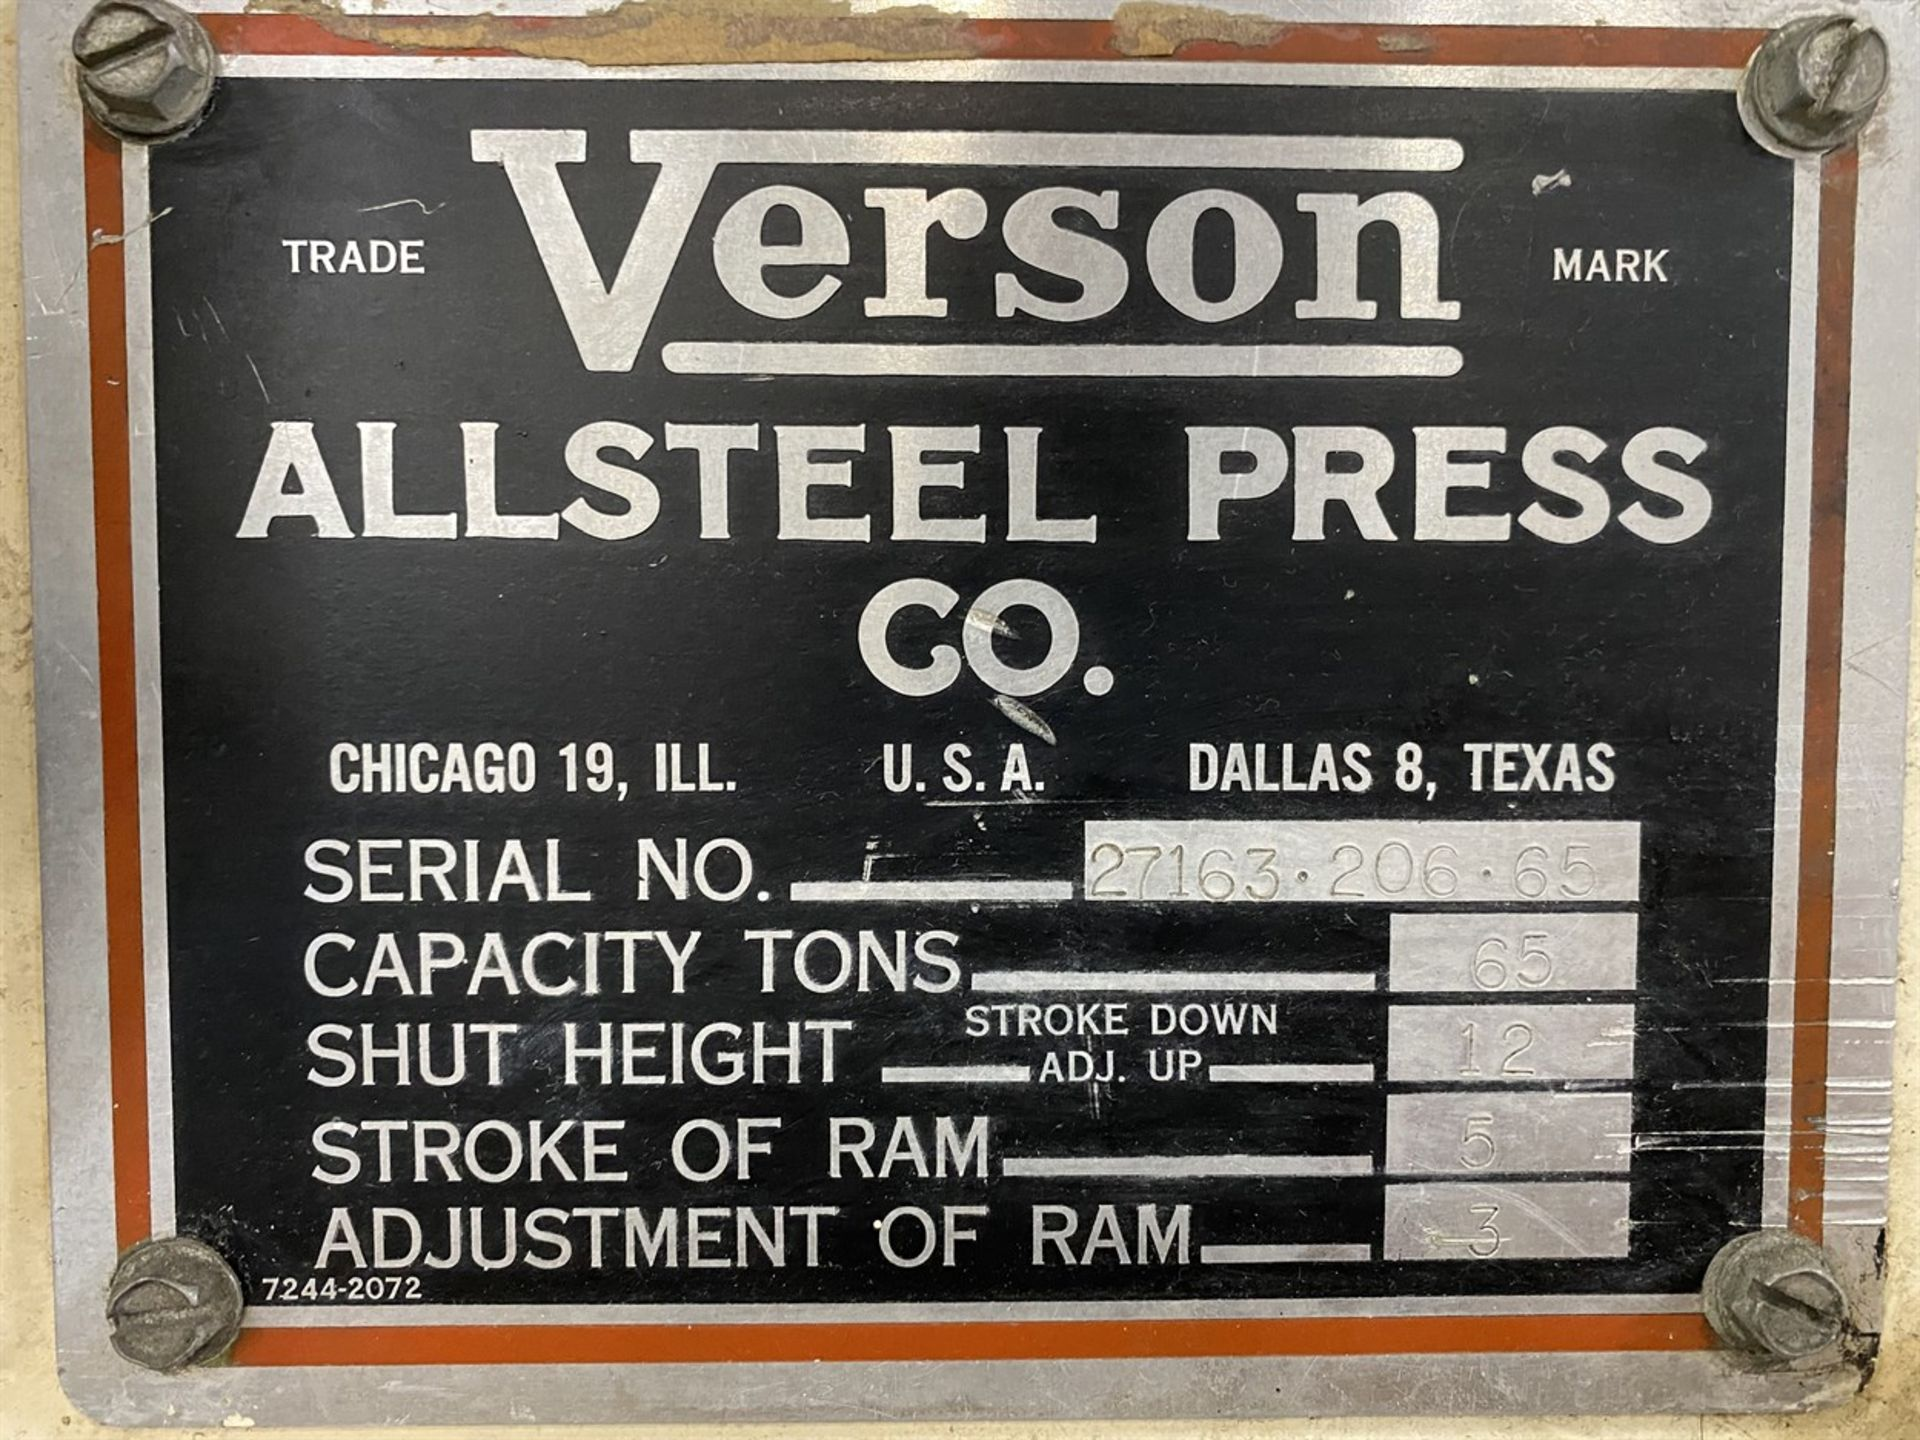 "Lot 28 - VERSON 65 Ton Press Brake, s/n 27163.206.65, 12"" Shut Height, 5"" Stroke, 3"" Adj, 108""OA, 78"" Between"